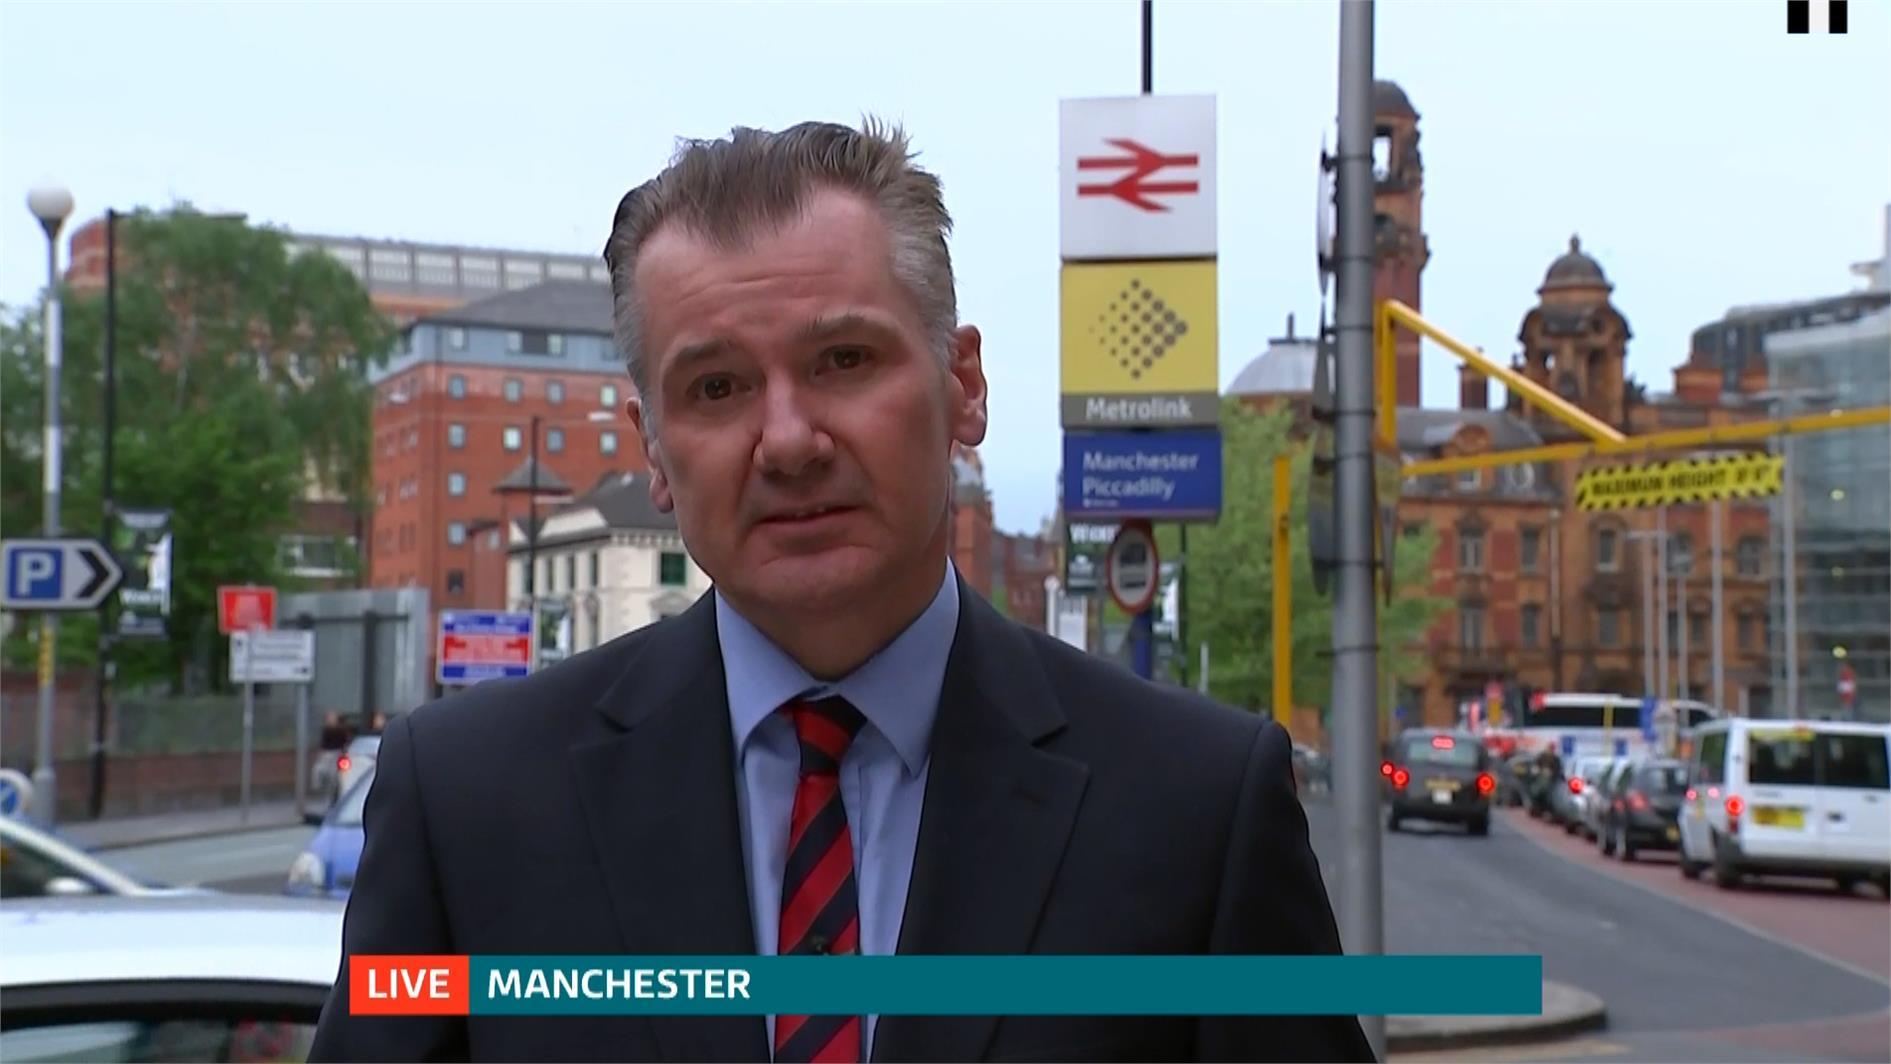 Chris Choi - ITV News Reporter (6)